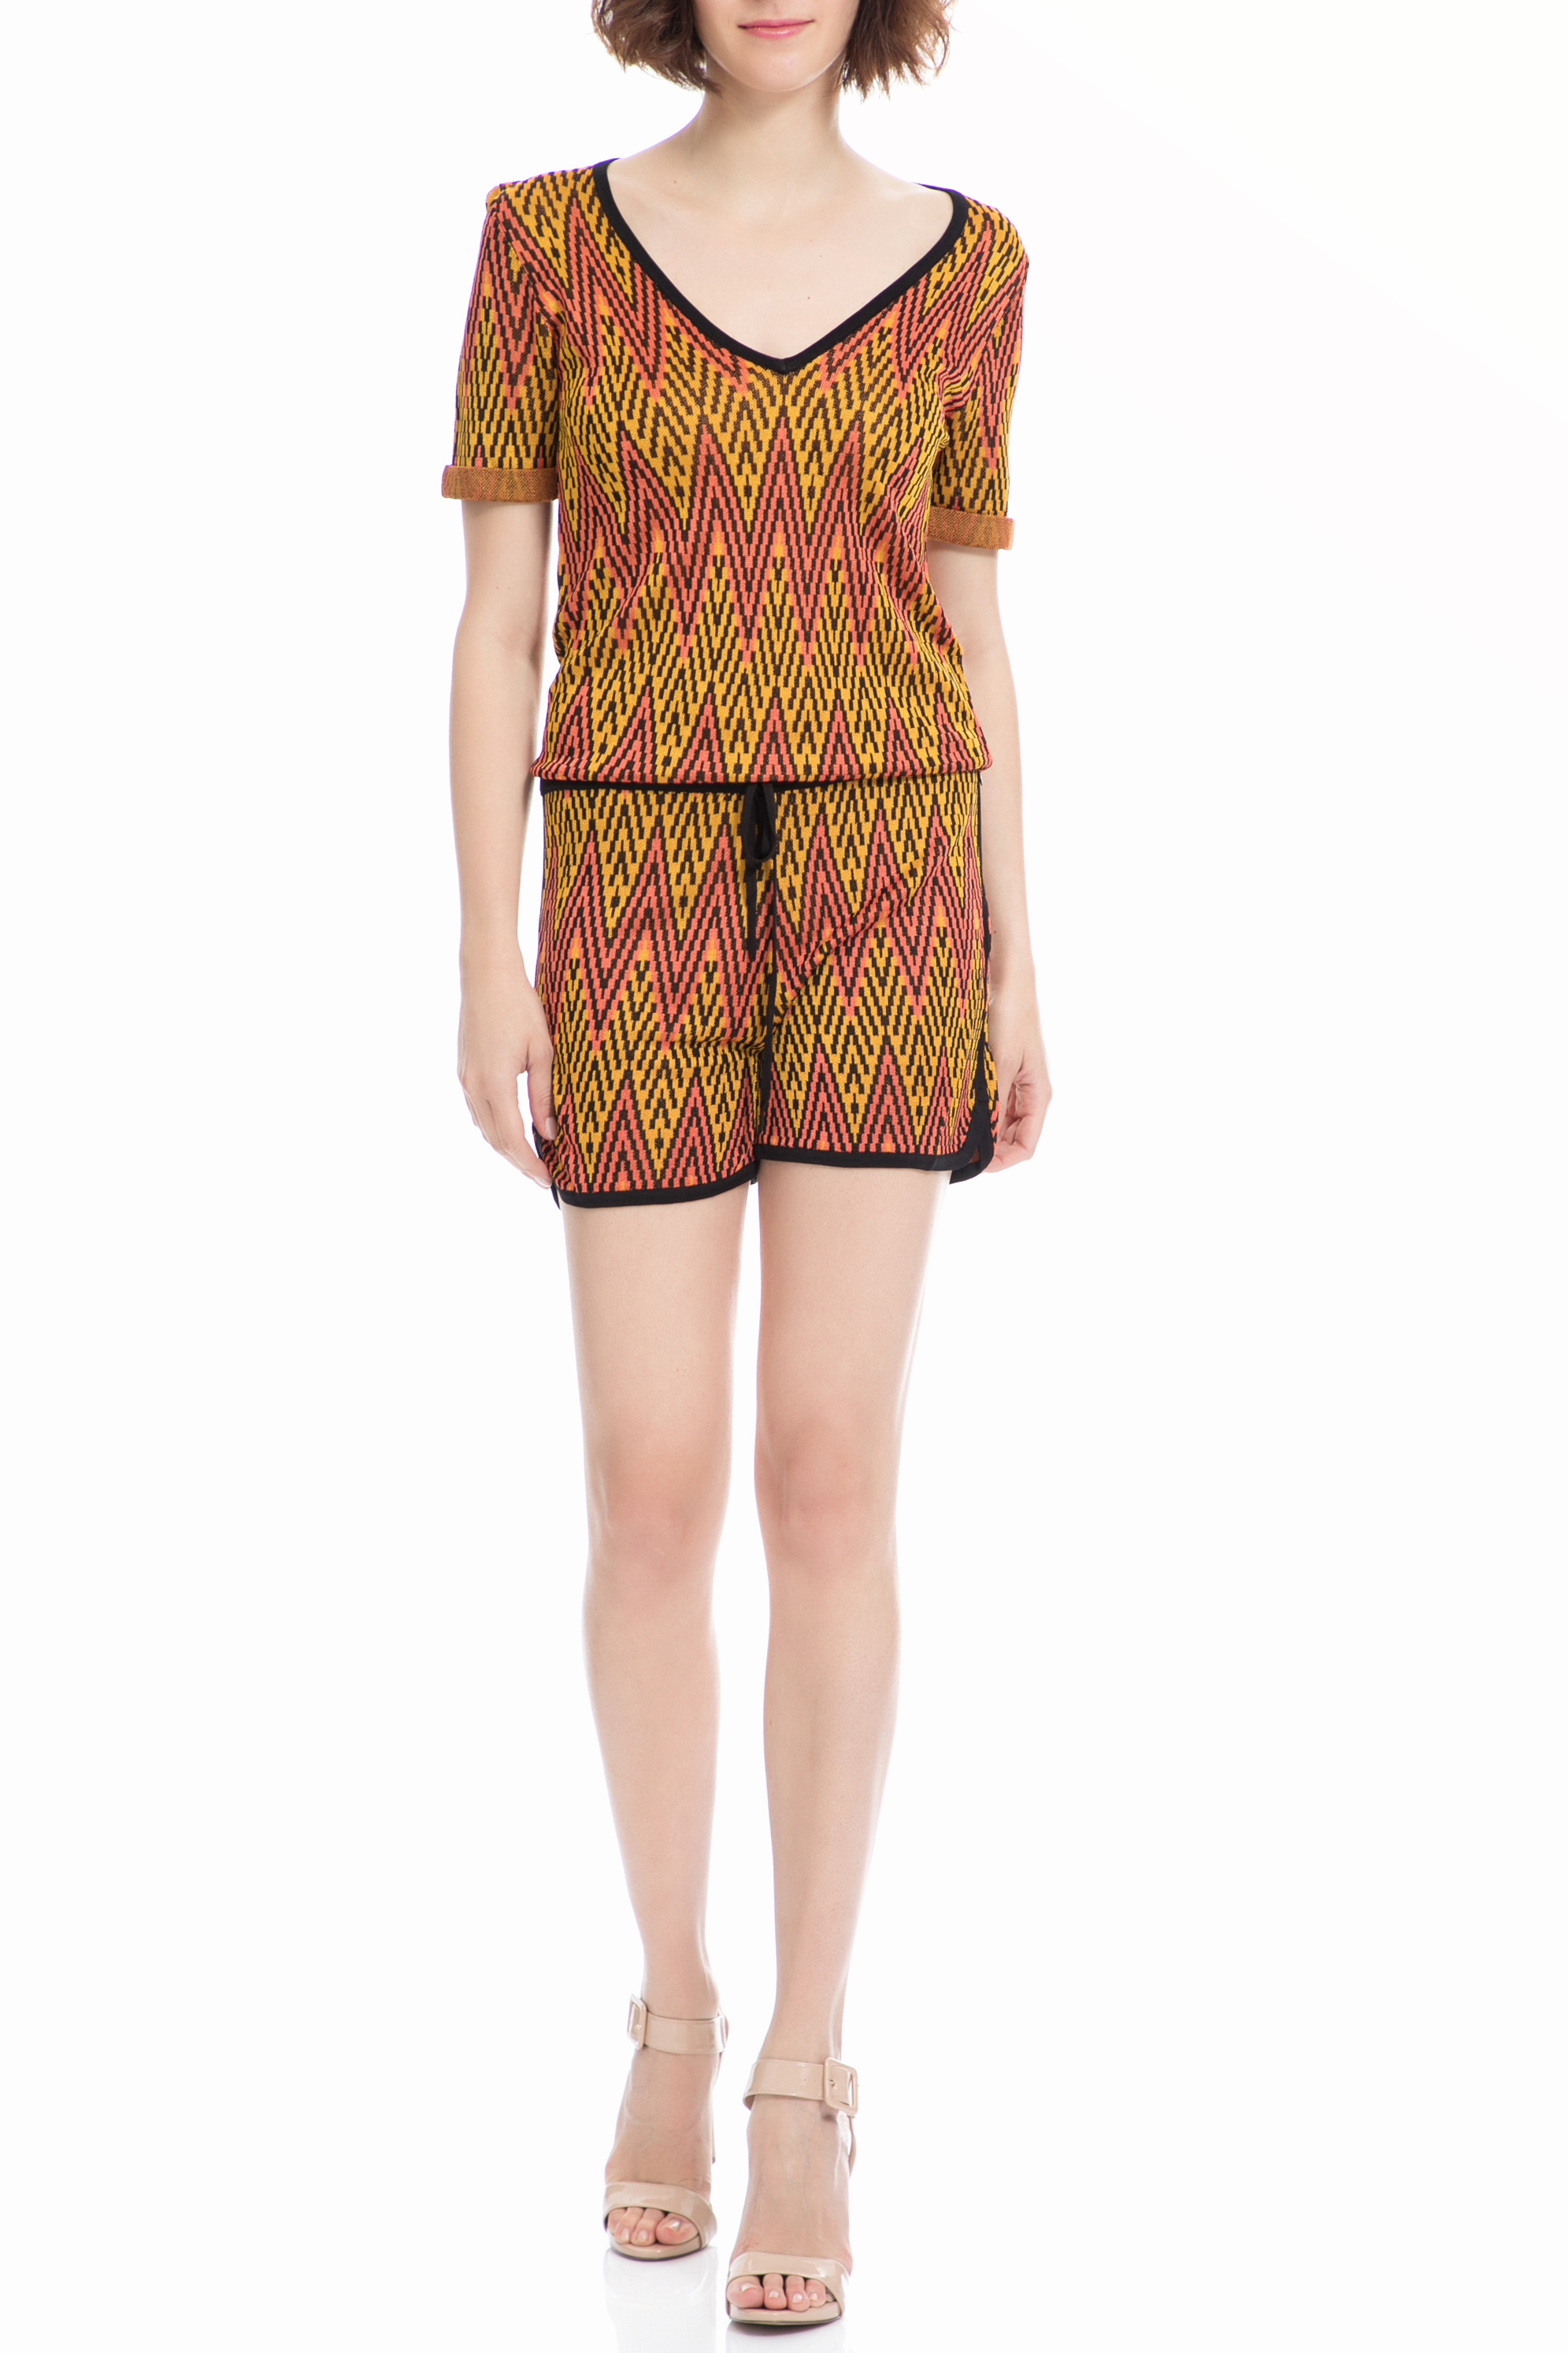 MAISON SCOTCH – Ολόσωμη φόρμα Maison Scotch κίτρινη-κοραλί